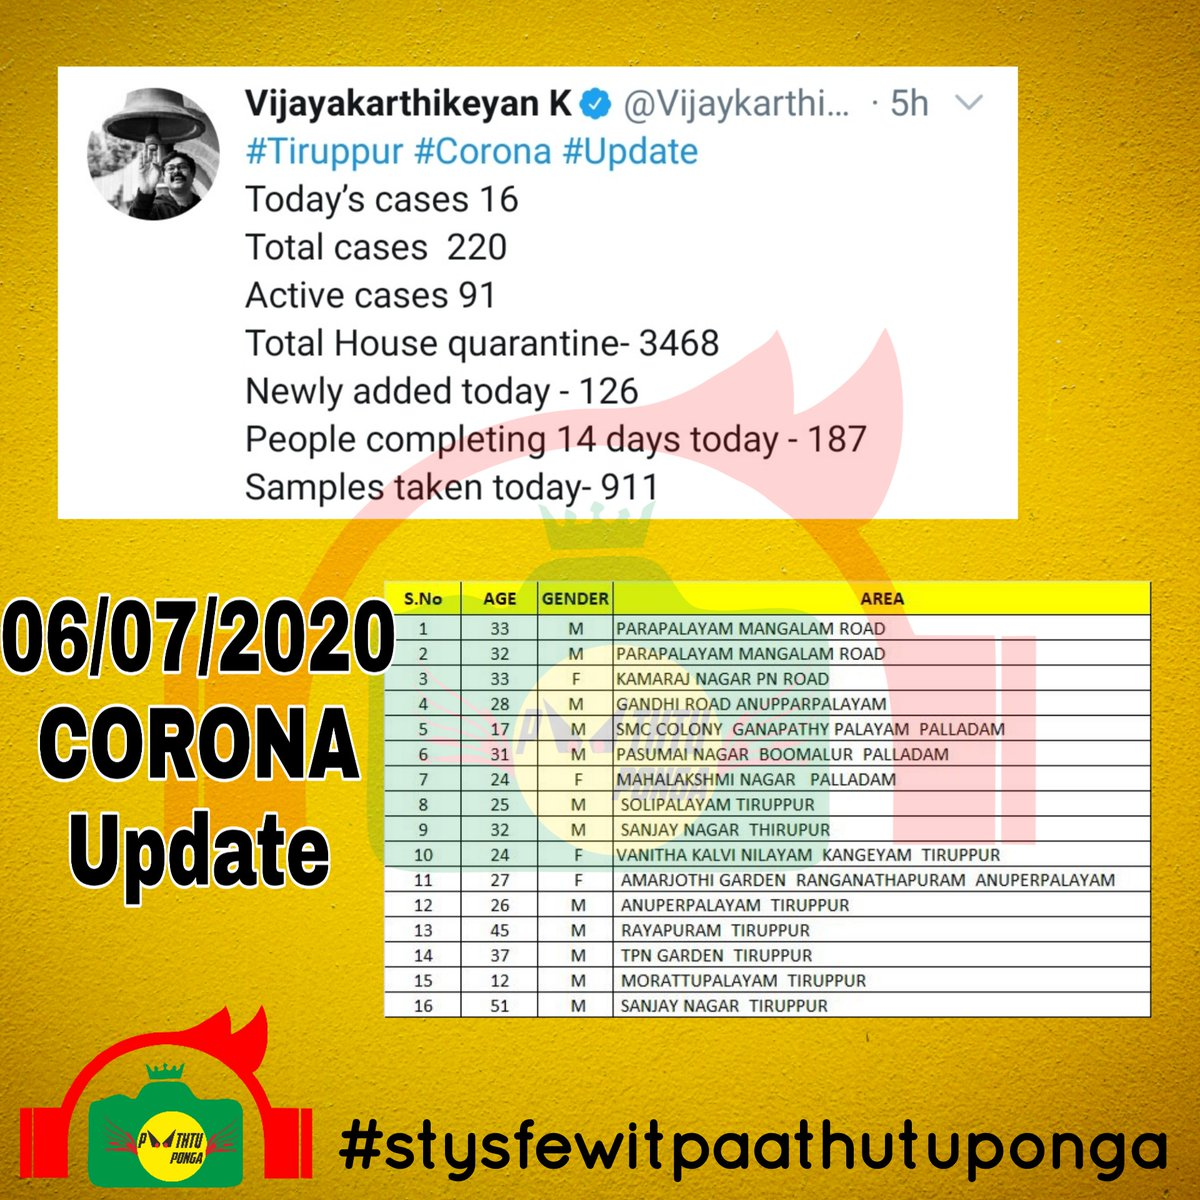 Stay safe at home  #stysfewitpaathutuponga #corona #covid_19 #italy #china #iran #america #india #paathutuponga #youtube #memes #tamil #goawaycoronavirus #kollywood #bollywood #hollywood #tamilquotes #coronaupdatesinindia https://t.co/J6kBfPGVlC